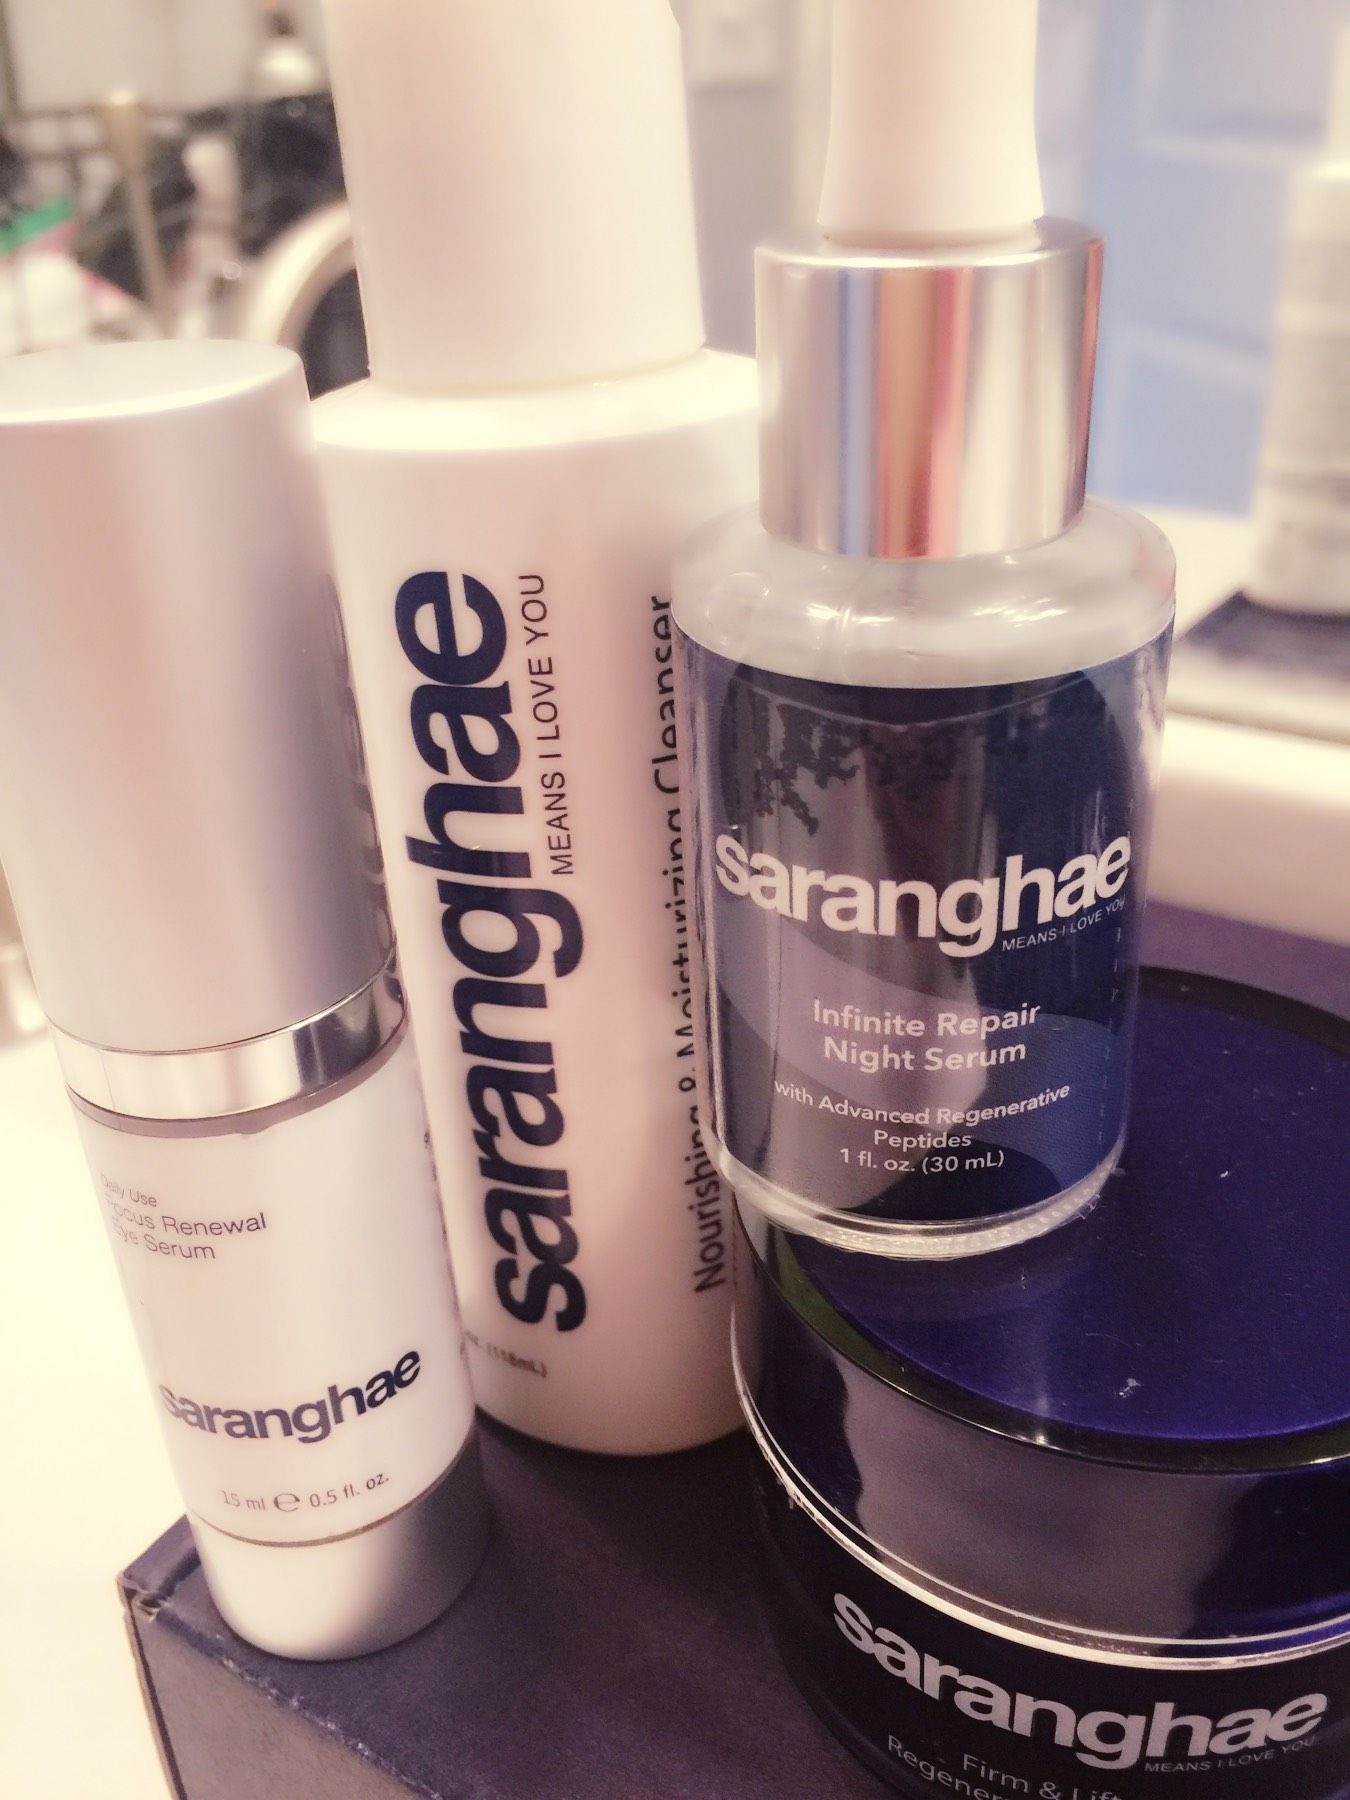 High Performance Skincare Saranghae Korean 5 Step Anti Aging Skincare Routine Review Anti Aging Skincare Routine Skin Care Routine Skin Care